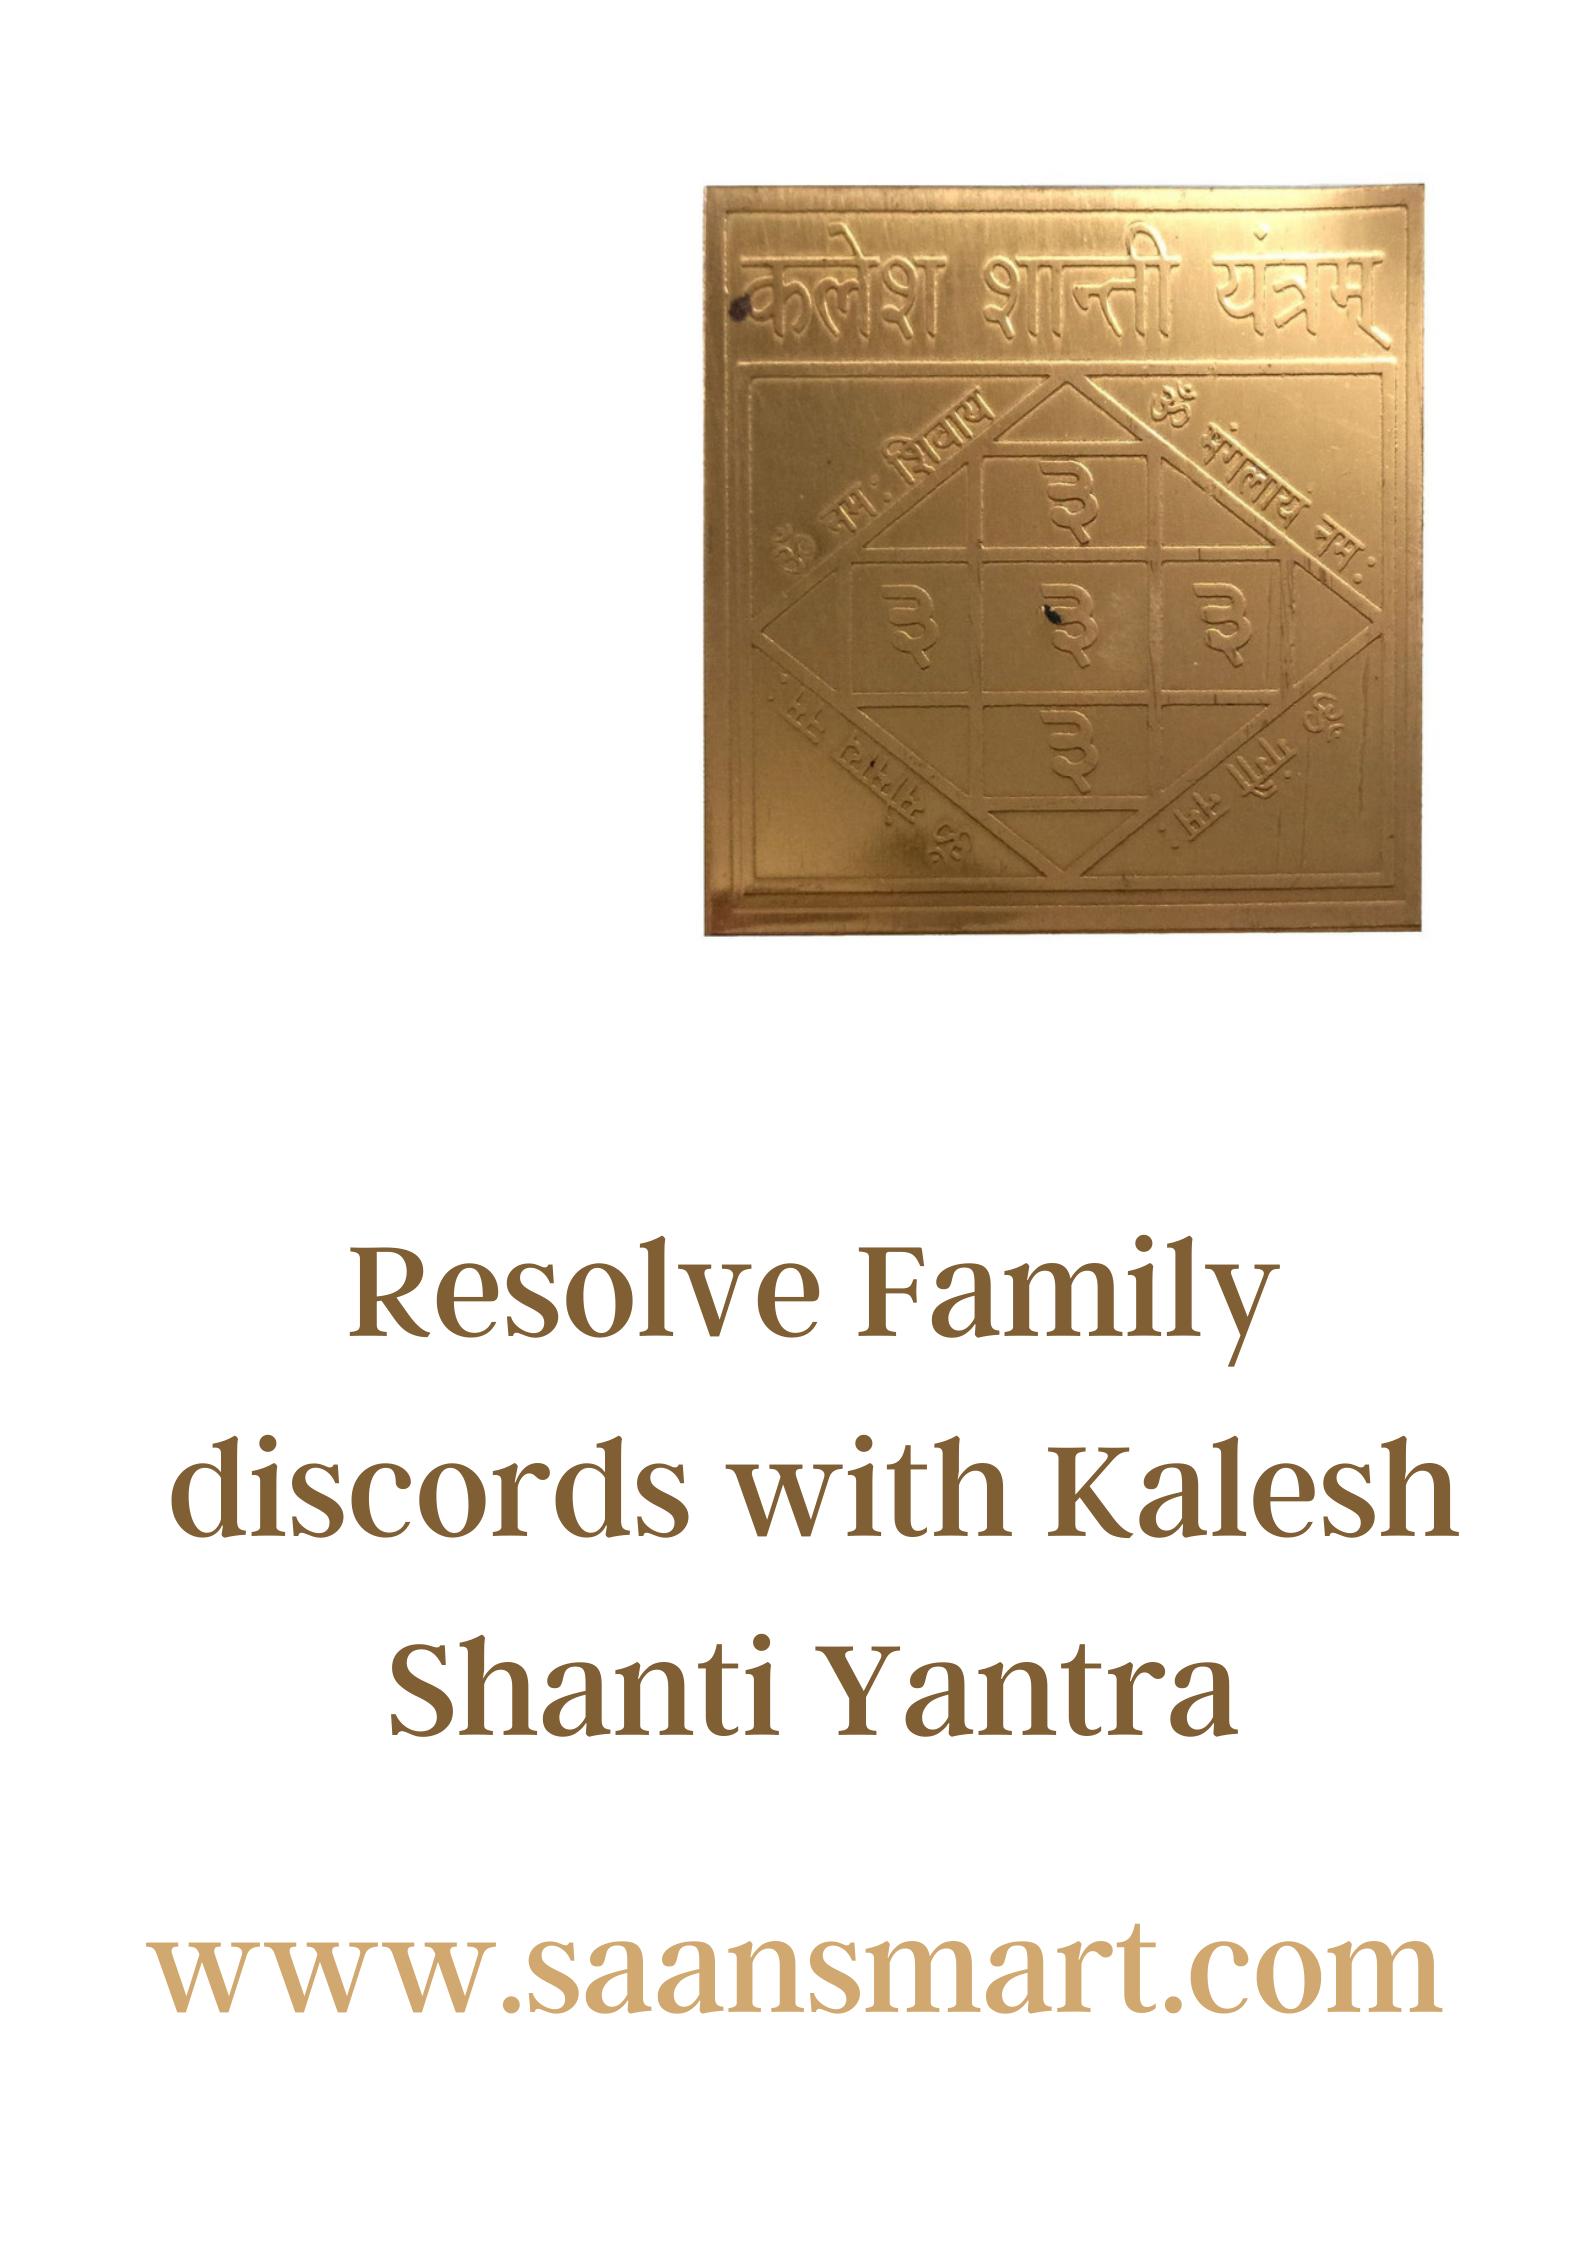 Dissolve family discord with the powerful Kalesh Shanti Yantra